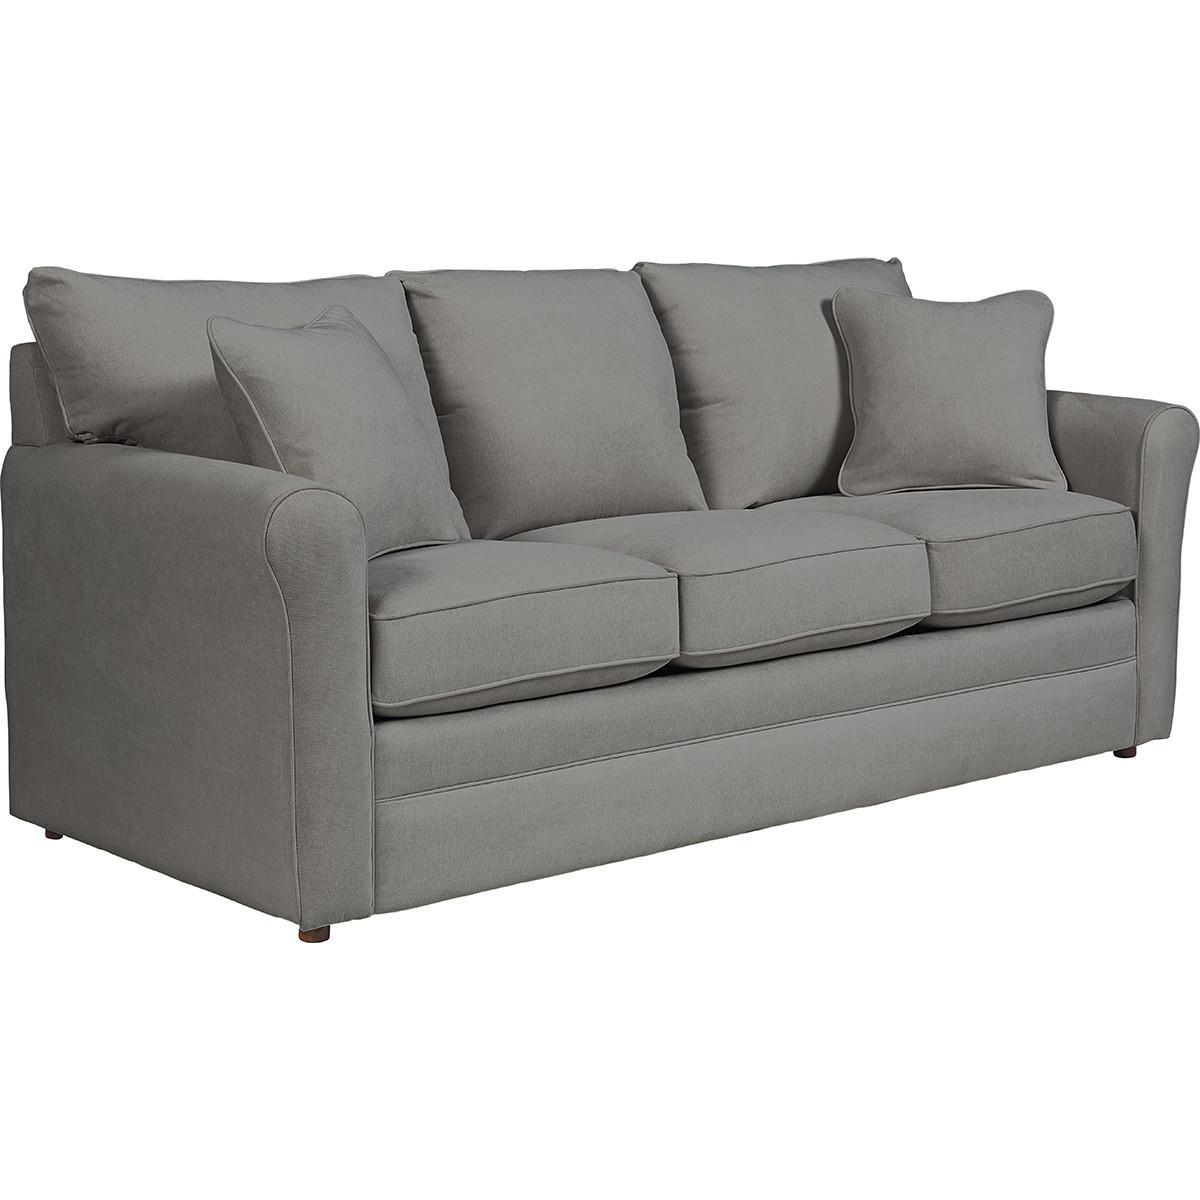 Chenille Sleeper Sofa 28 With Chenille Sleeper Sofa | Jinanhongyu Regarding Chenille Sleeper Sofas (View 12 of 20)